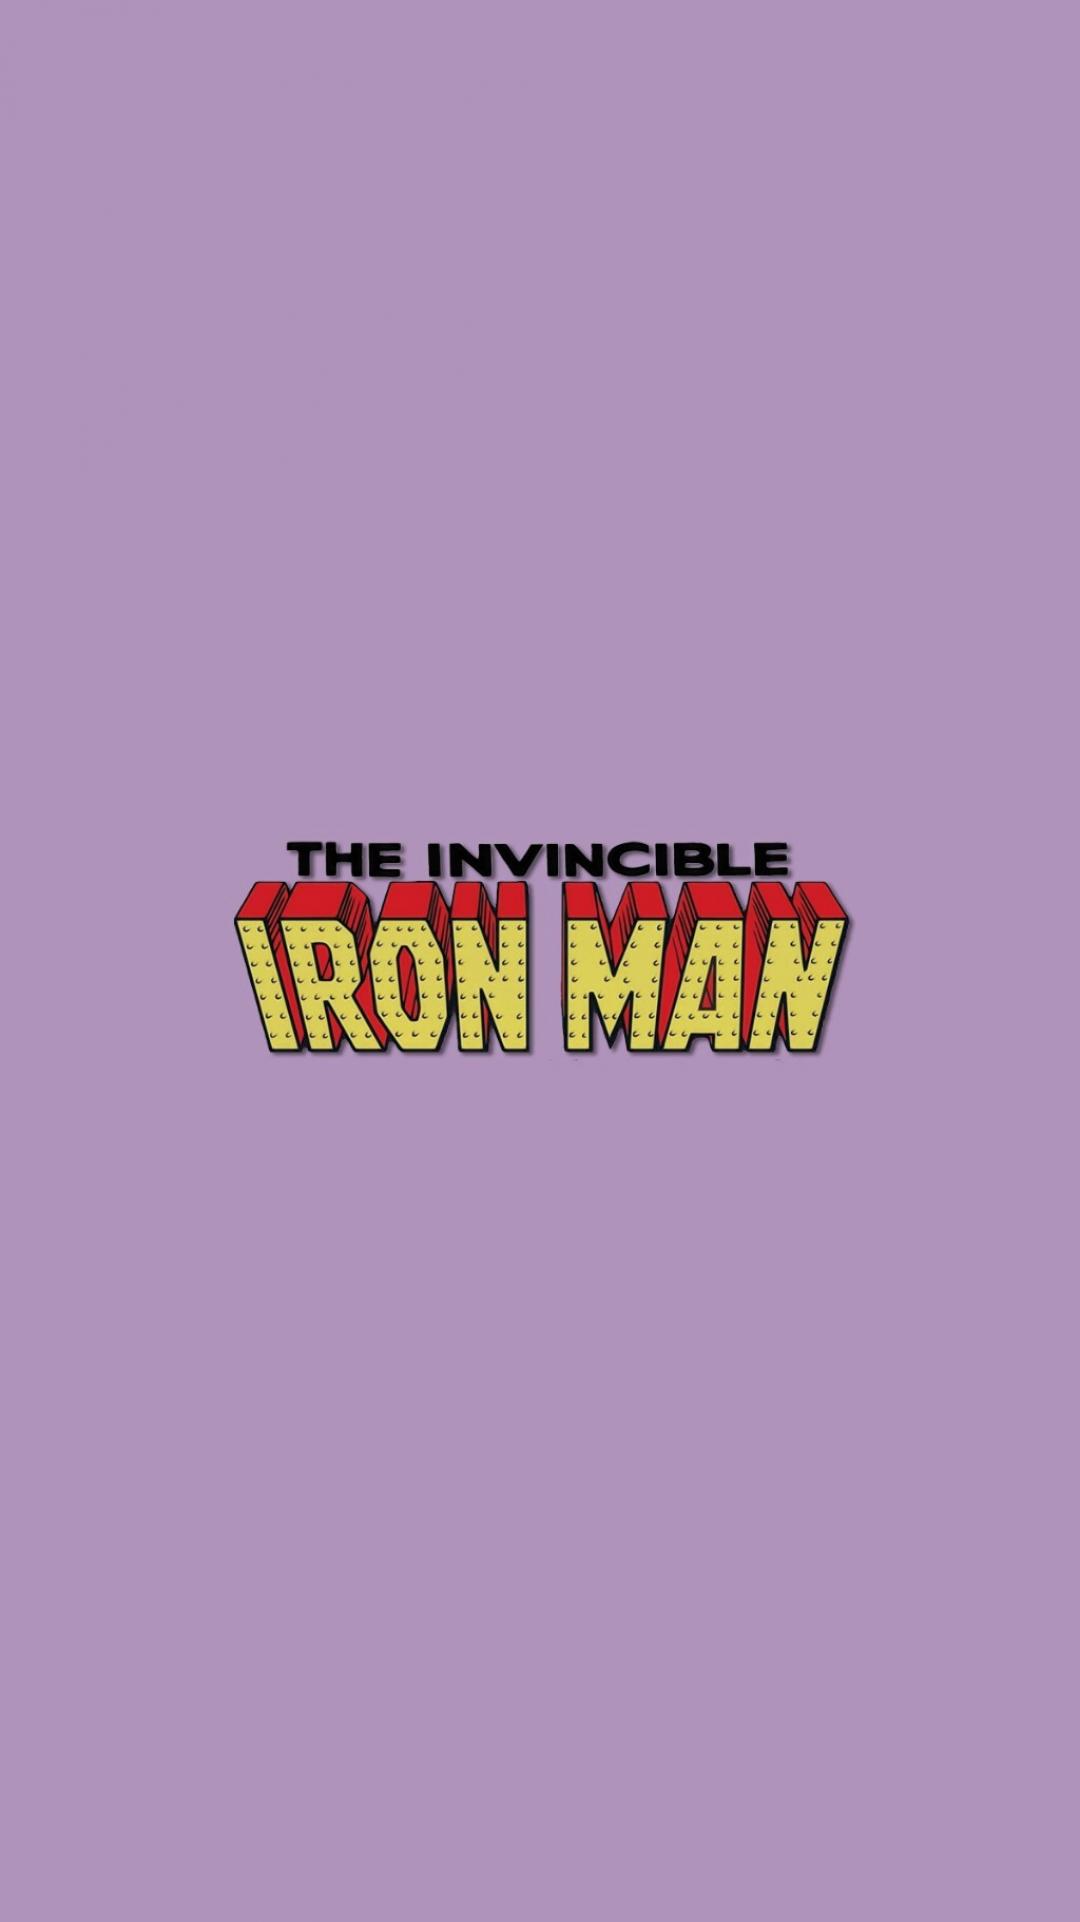 15 Wallpaper Marvel Desktop Iron Man In 2020 Tumblr Iphone Wallpaper Iphone Backgrounds Tumblr Marvel Wallpaper